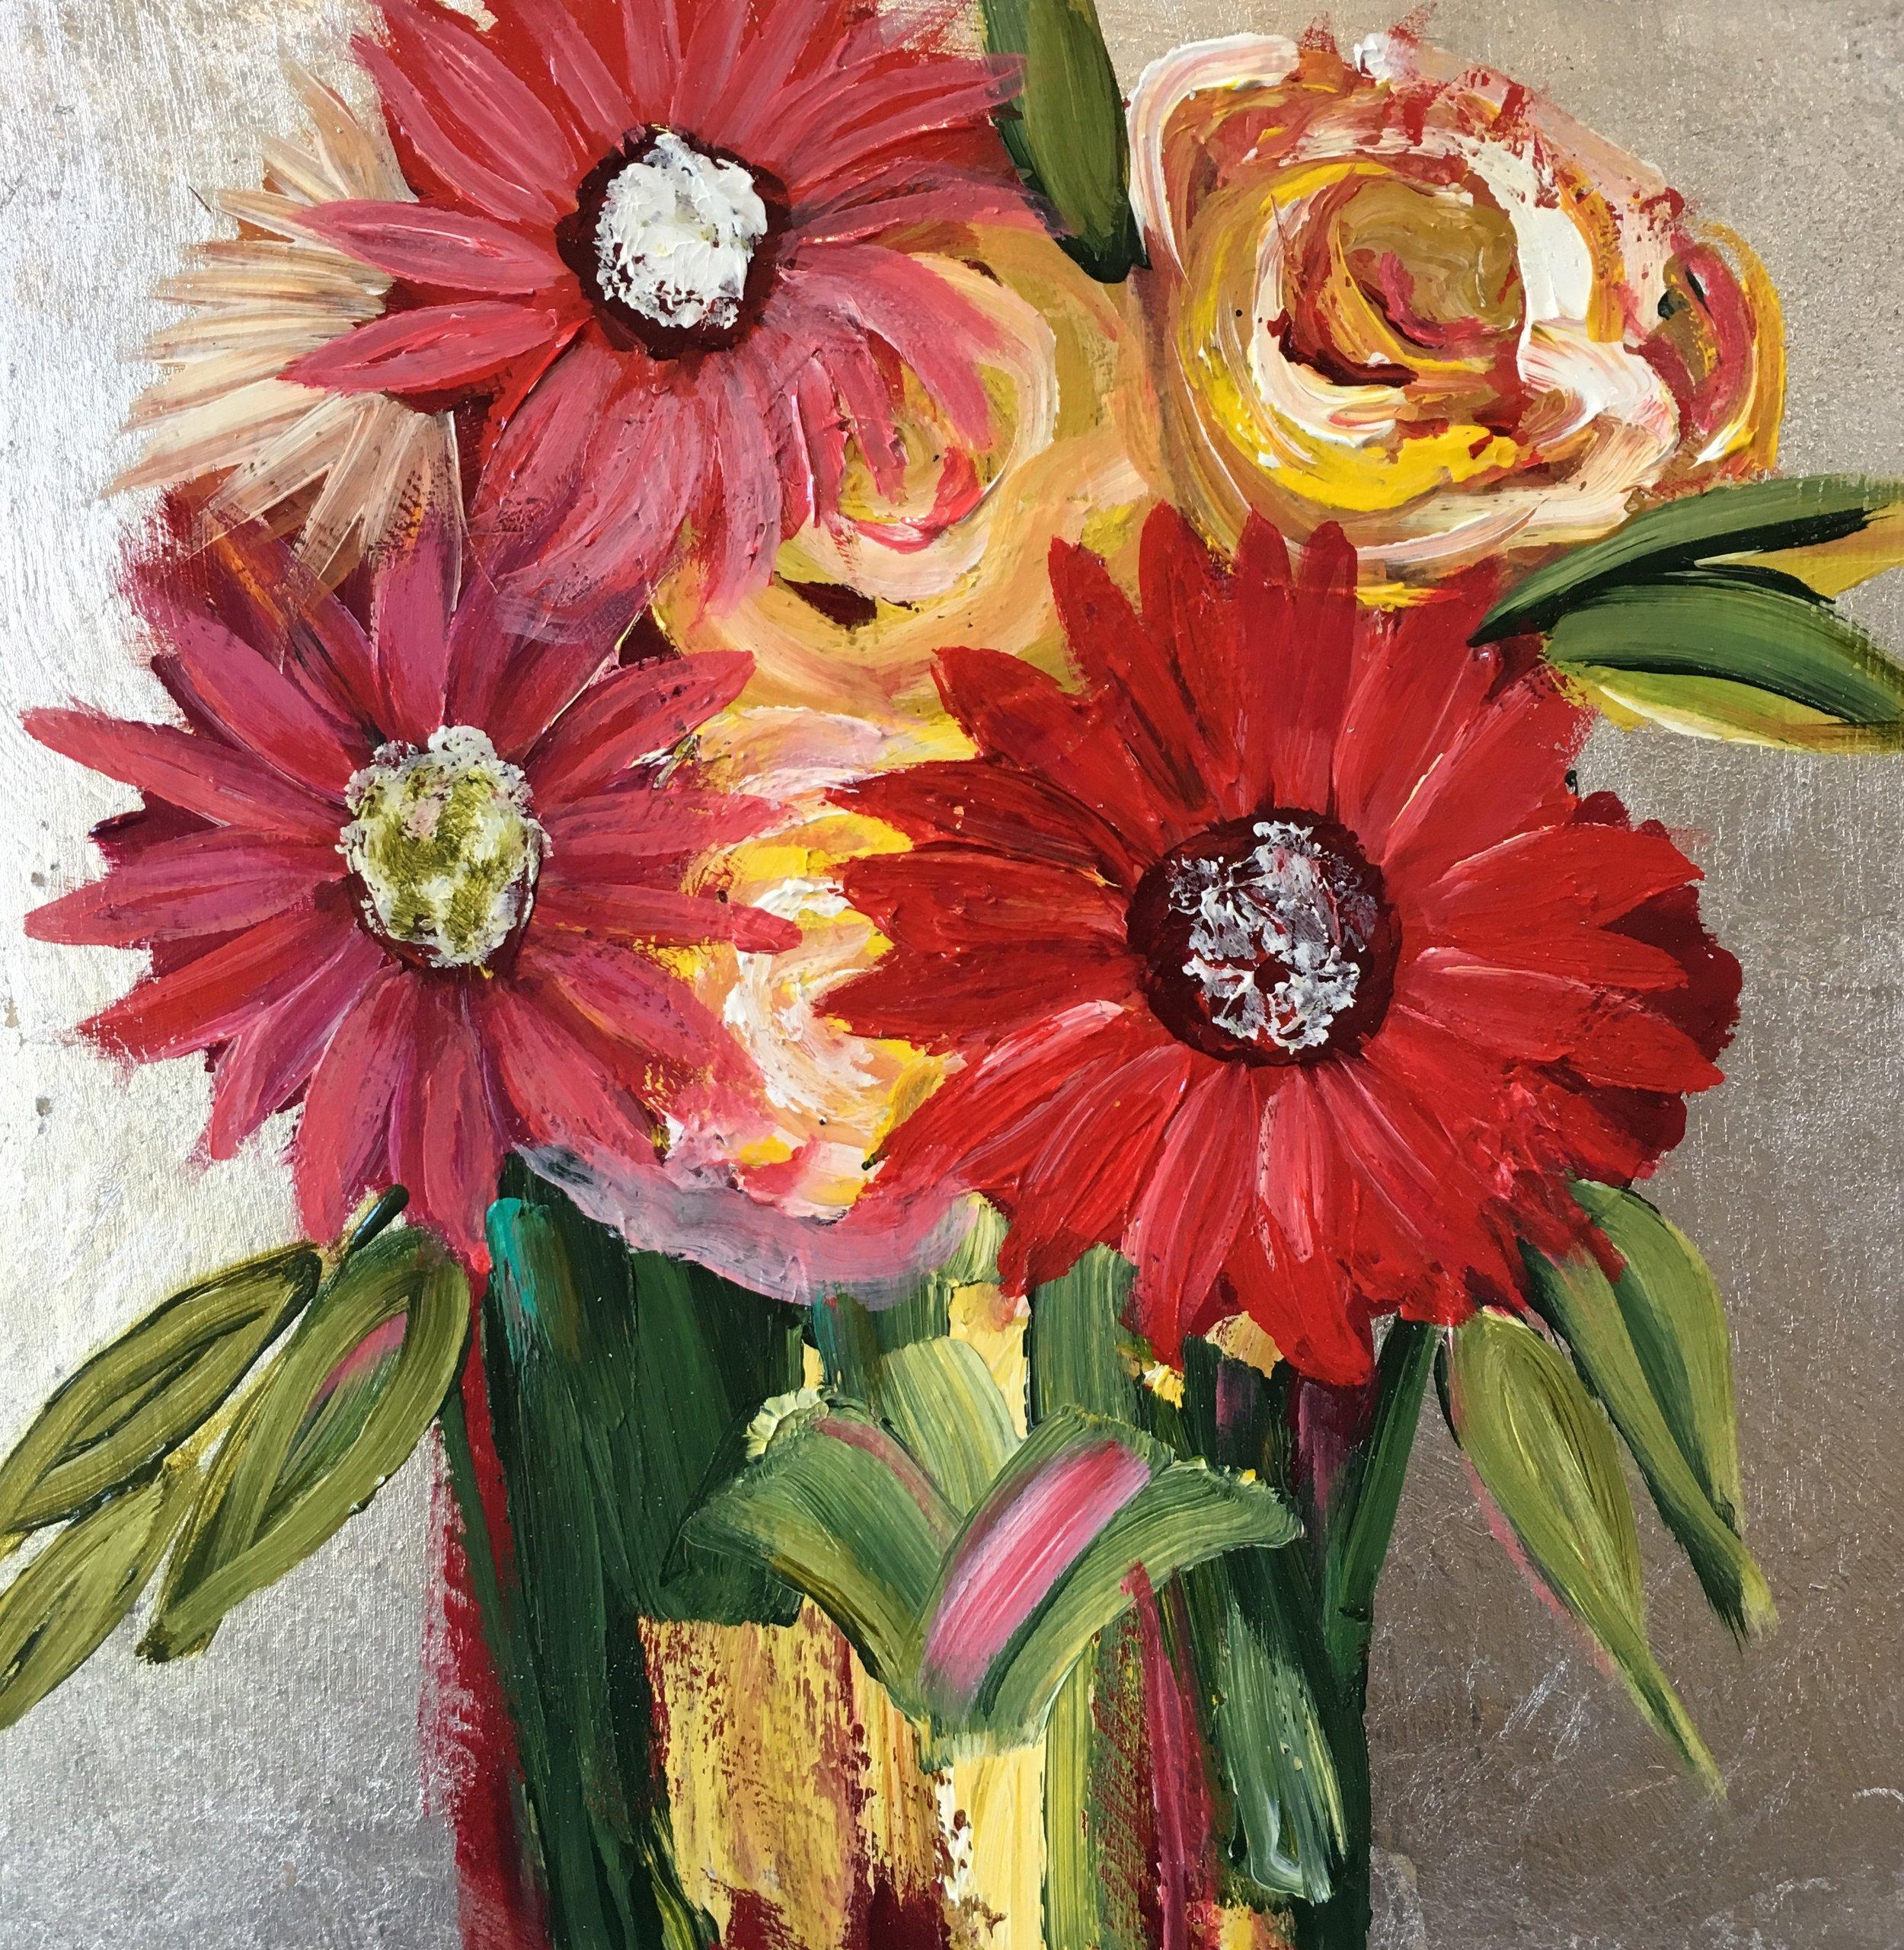 Blooms 3 25cm x 25cm.jpg